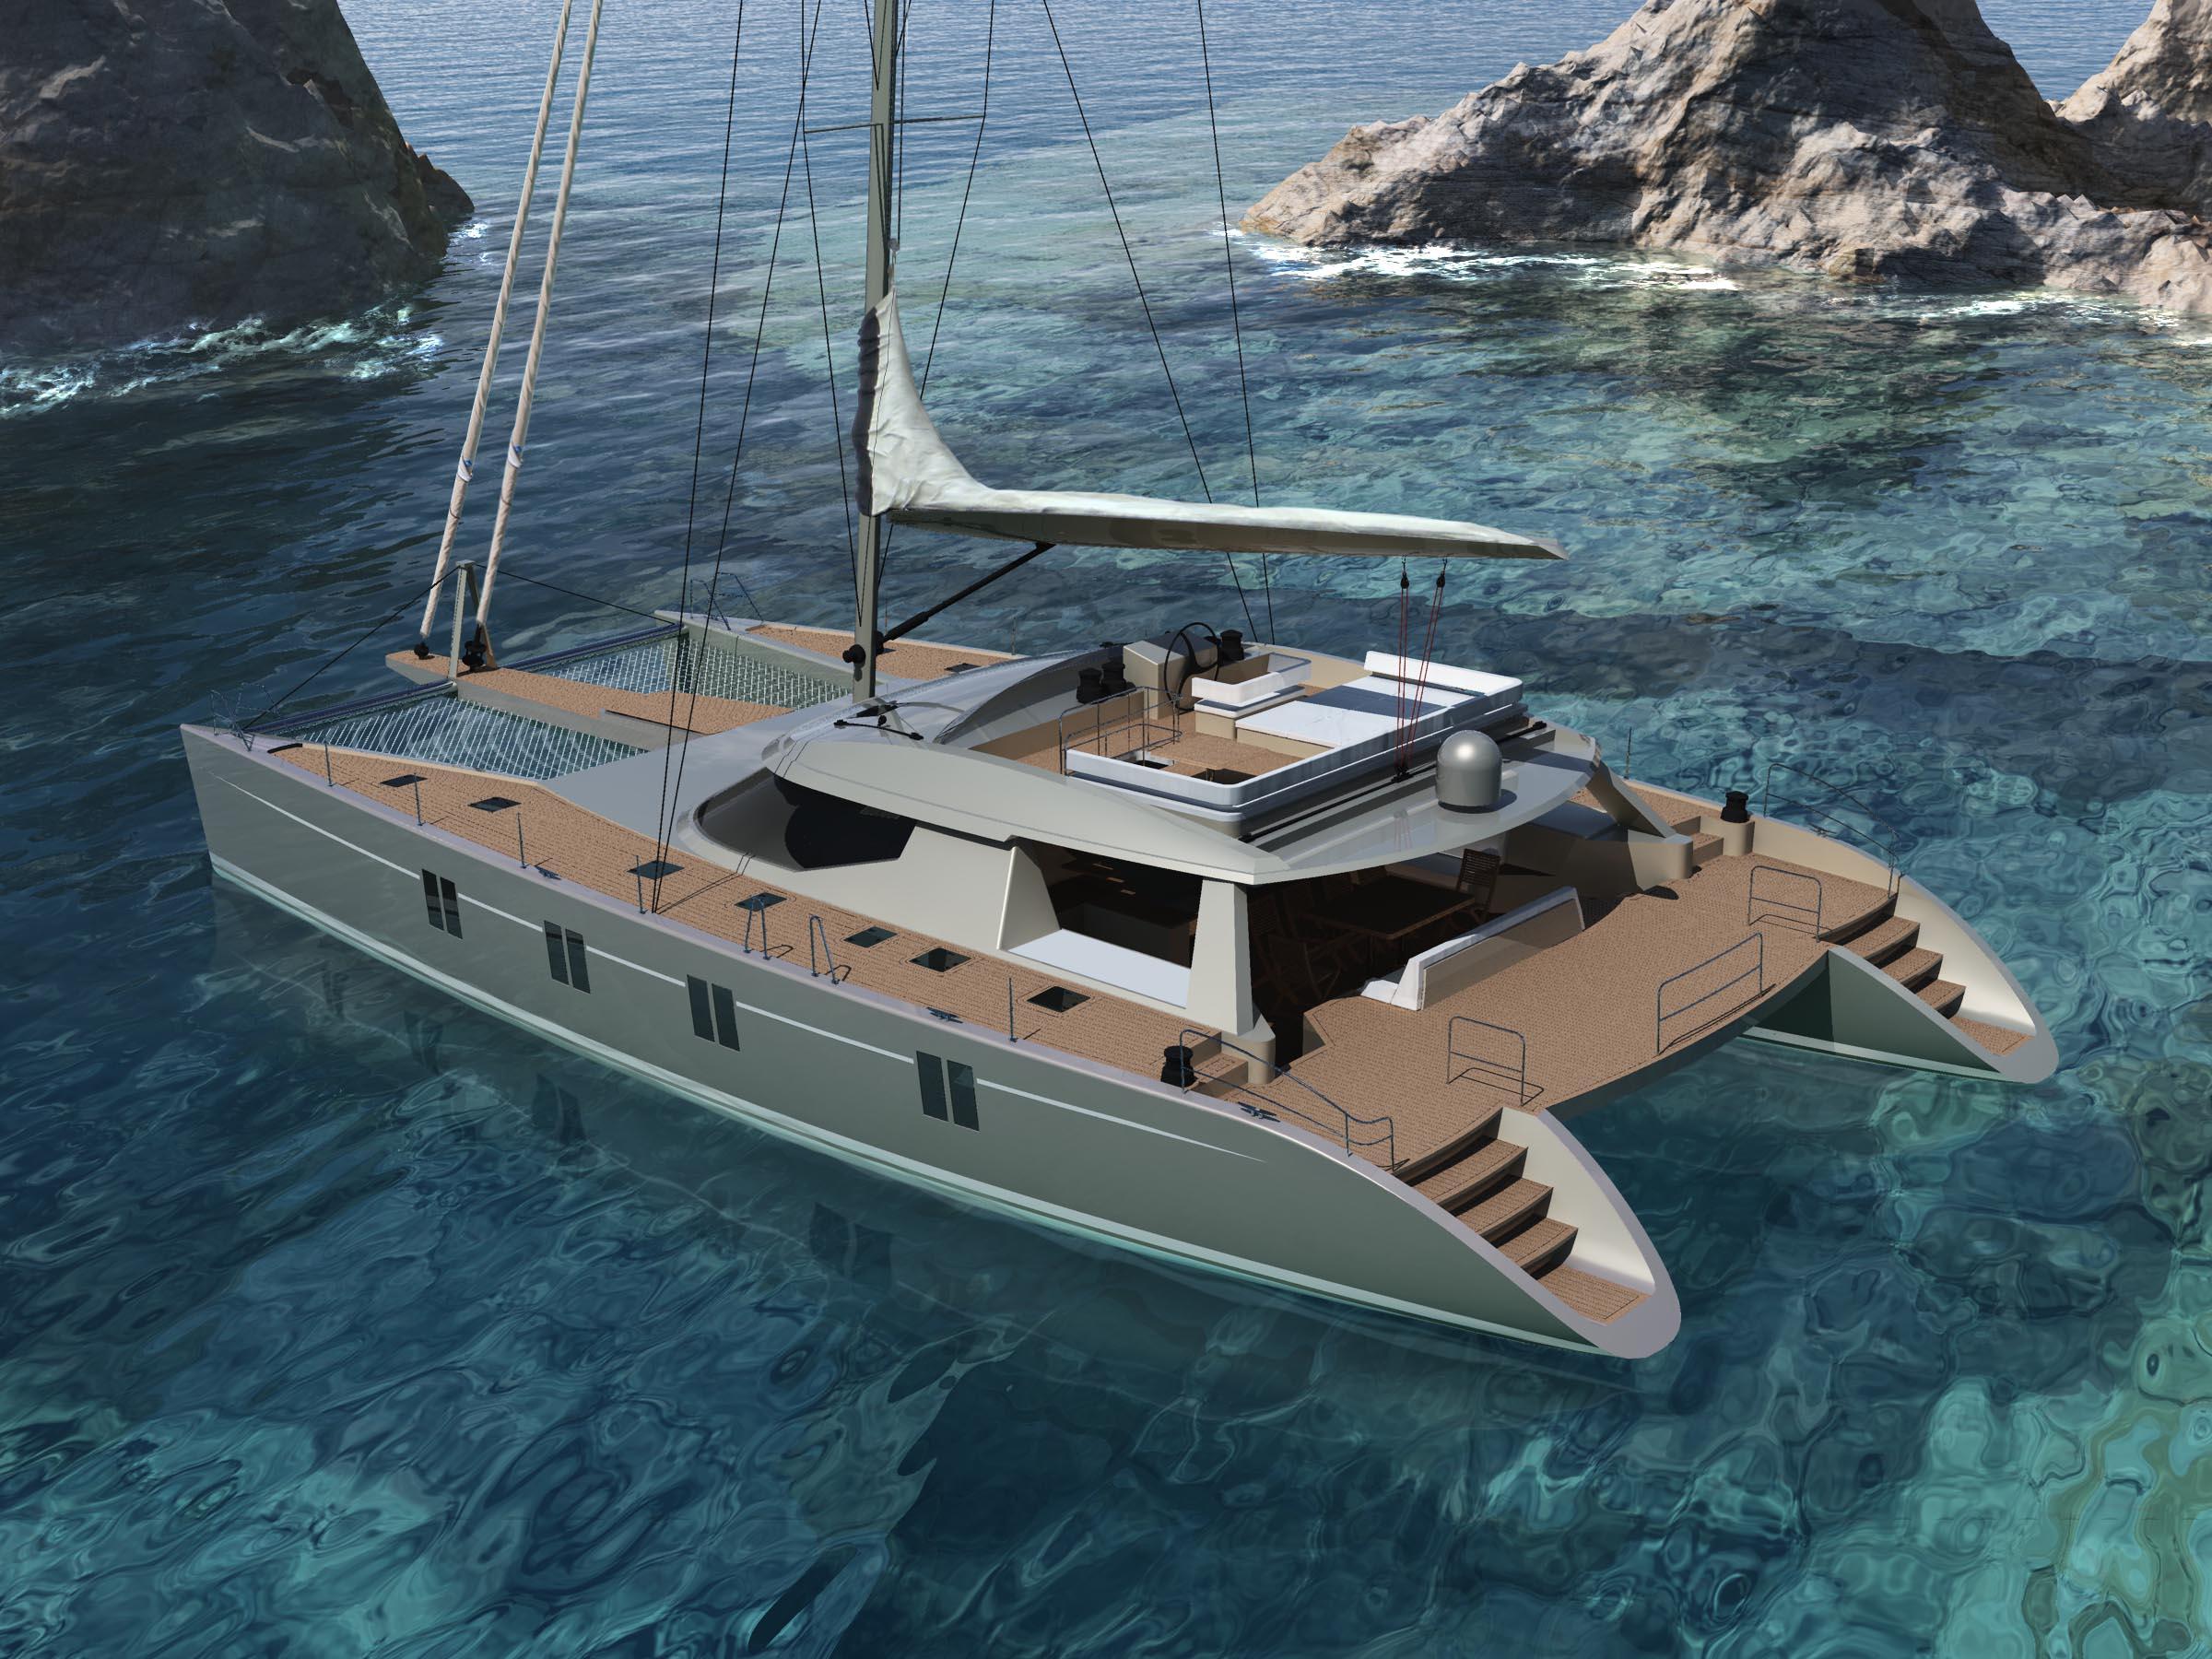 Sailing Catamaran Havana 72 designed by Berret Racoupeau Yacht Design - Image courtesy of Alu ...